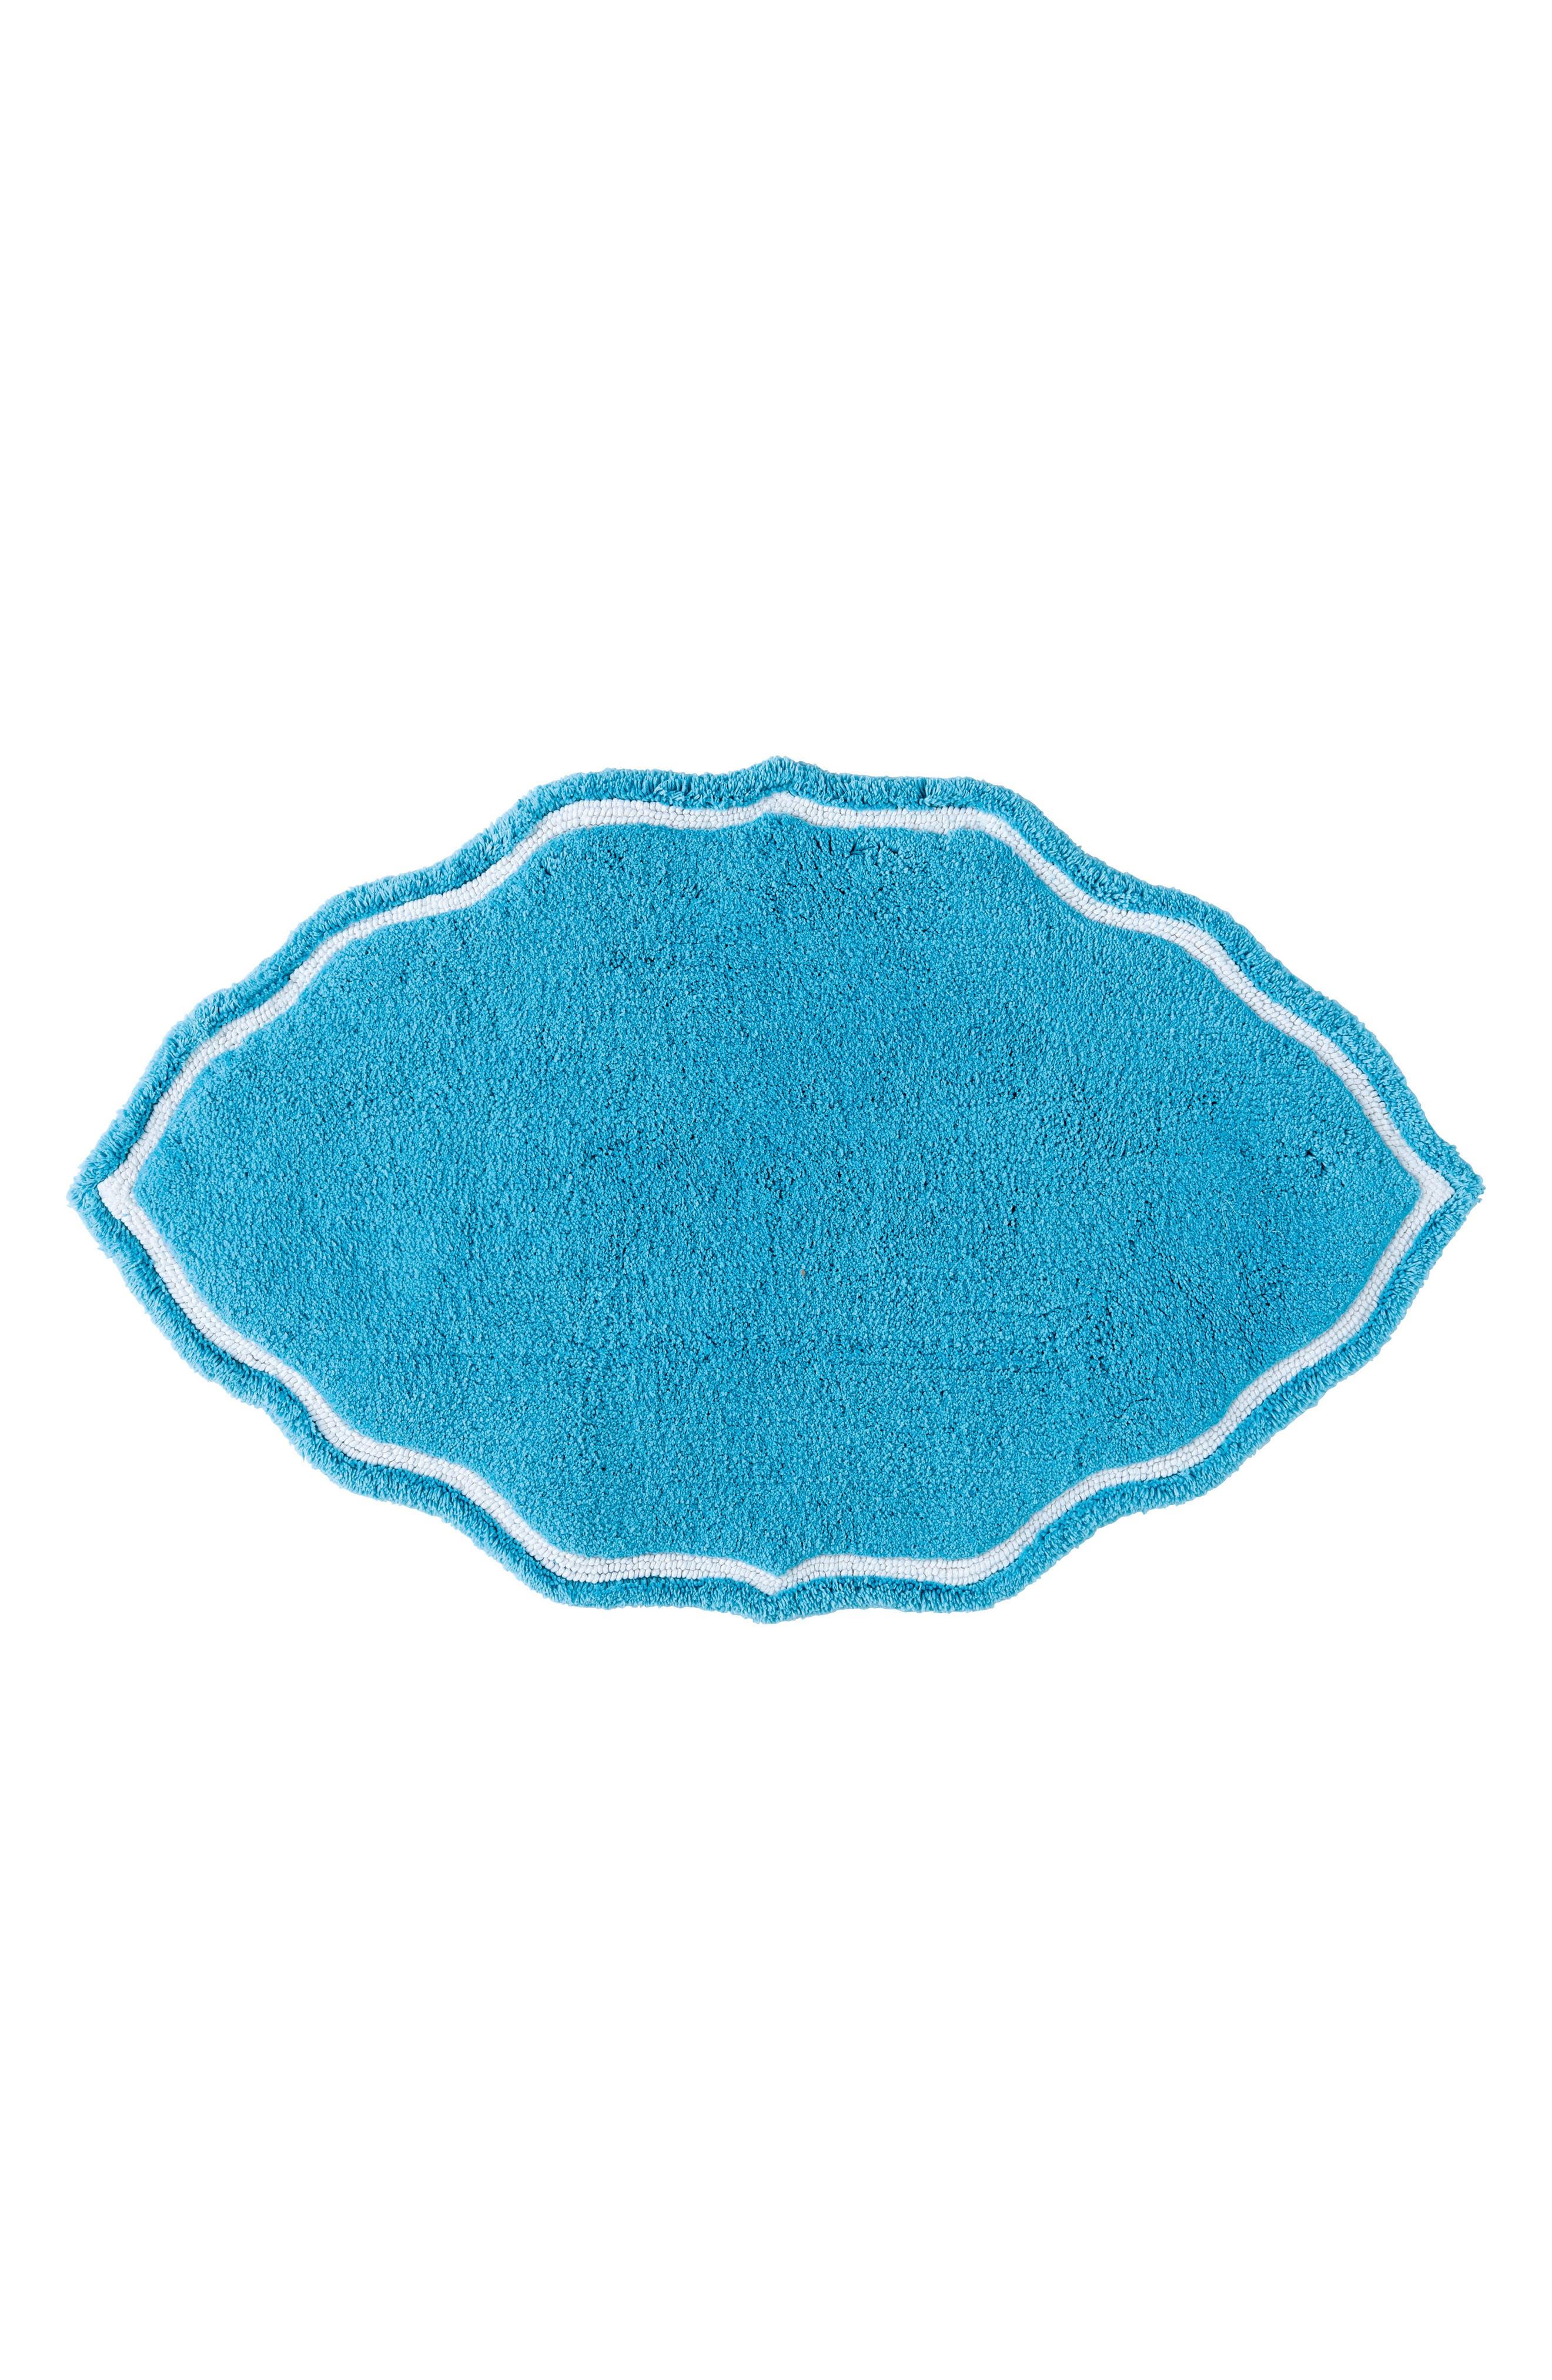 Signature Hand Tufted Bath Rug,                         Main,                         color, 500